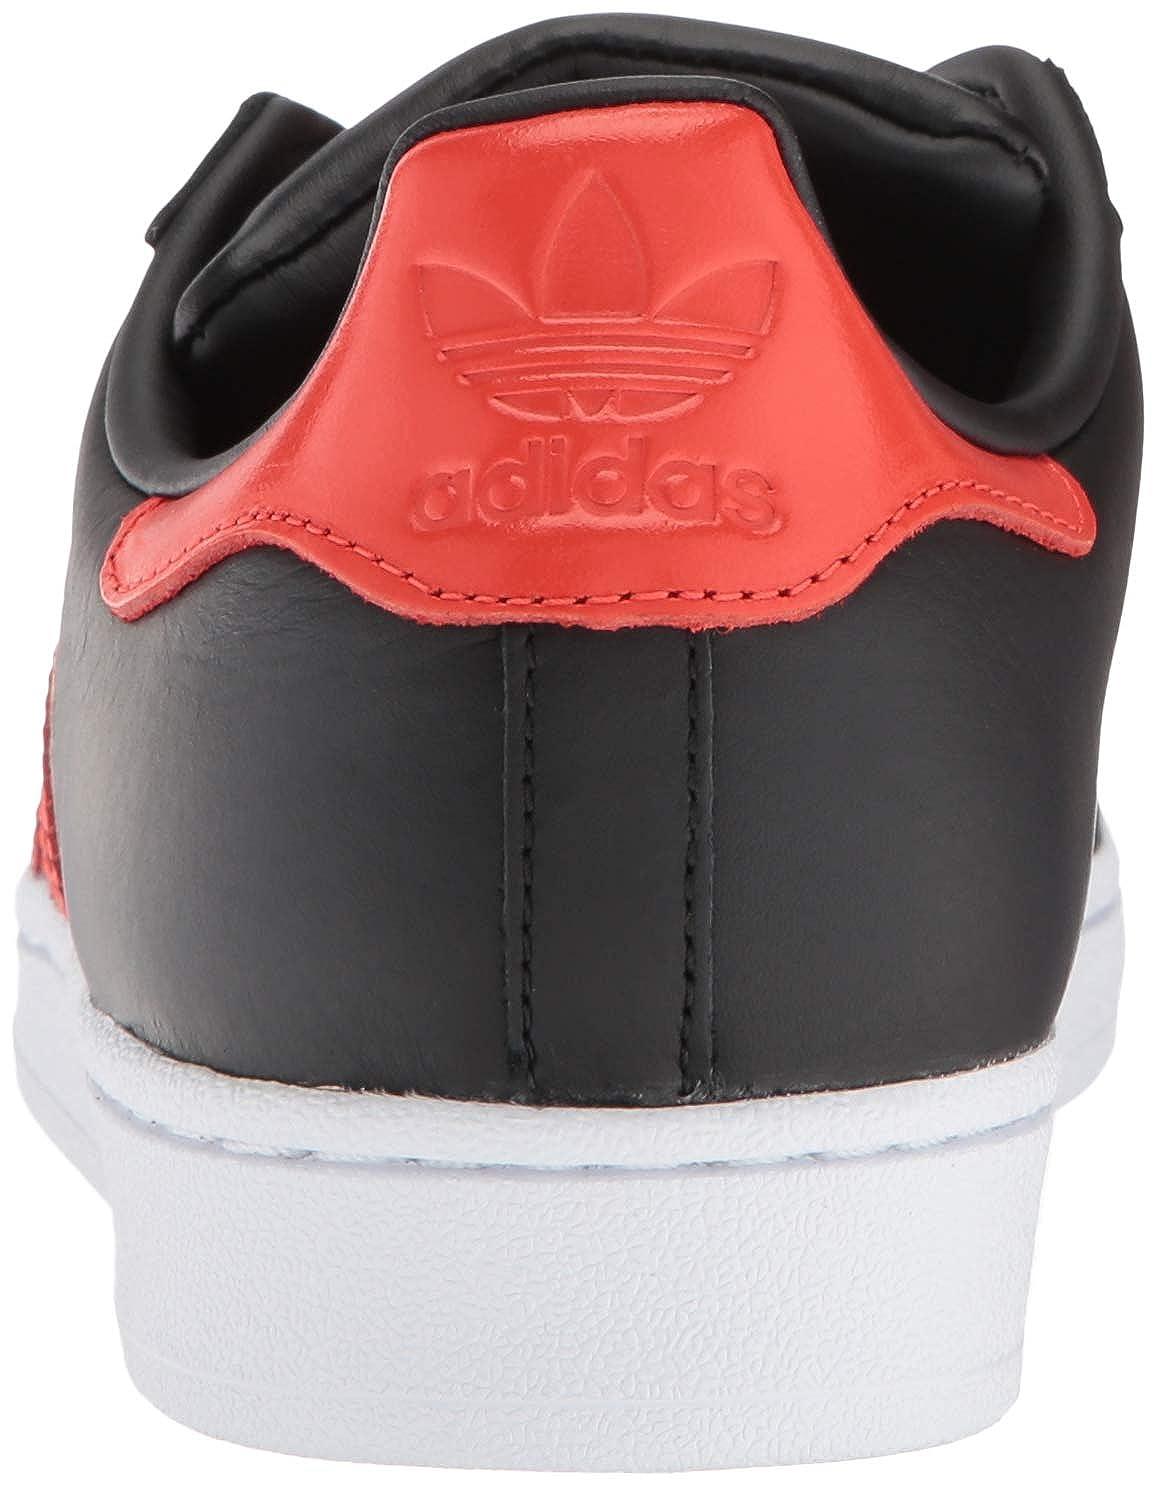 Adidas Originals  Superstar Foundation Foundation Foundation Scarpe da Ginnastica Unisex - Adulto | Buon design  3c38e5